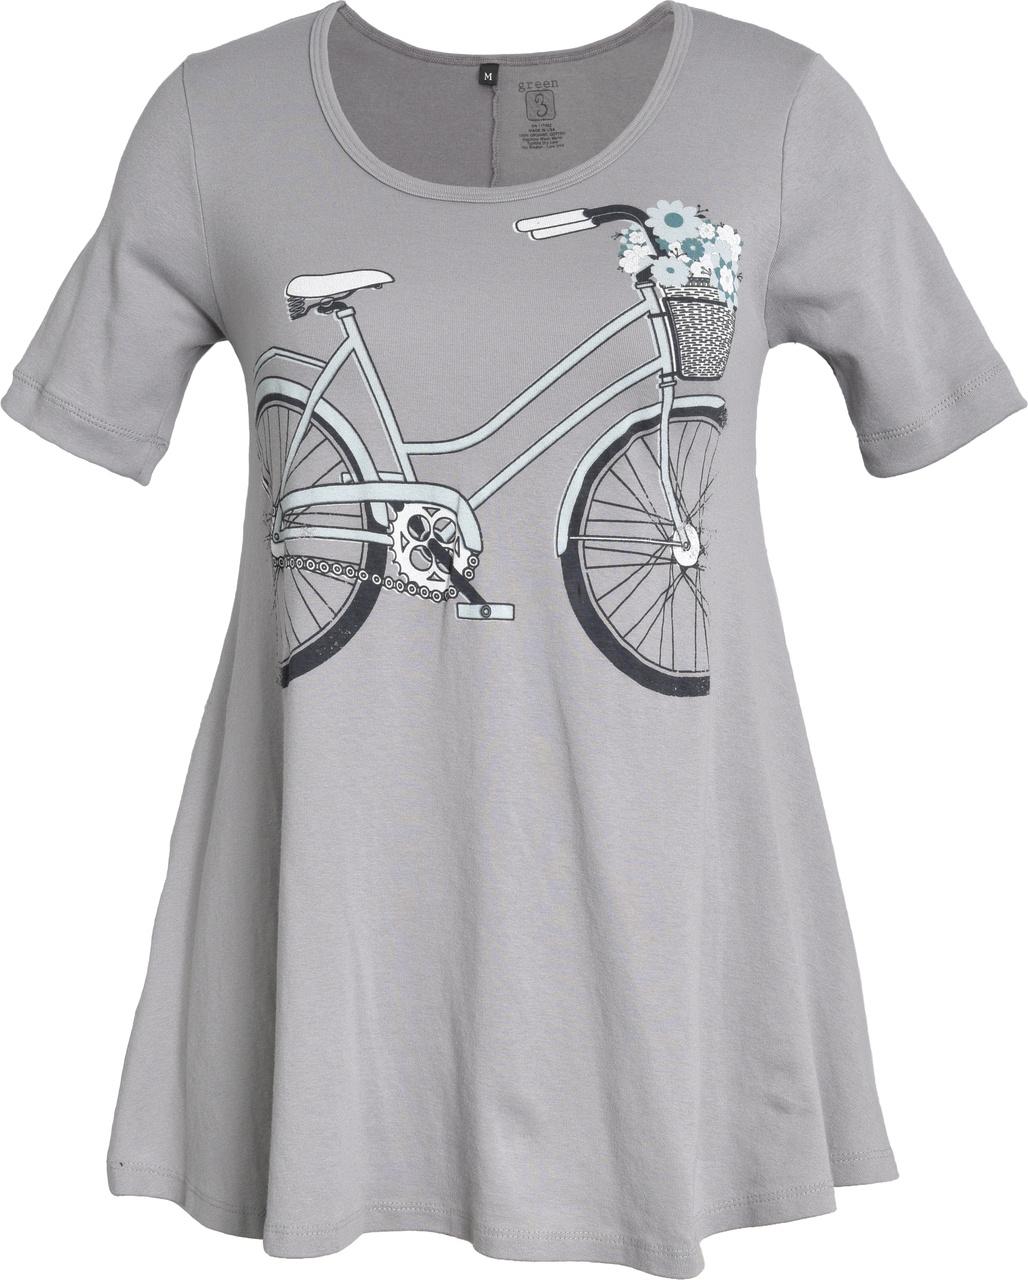 Bicycle SS Tunic